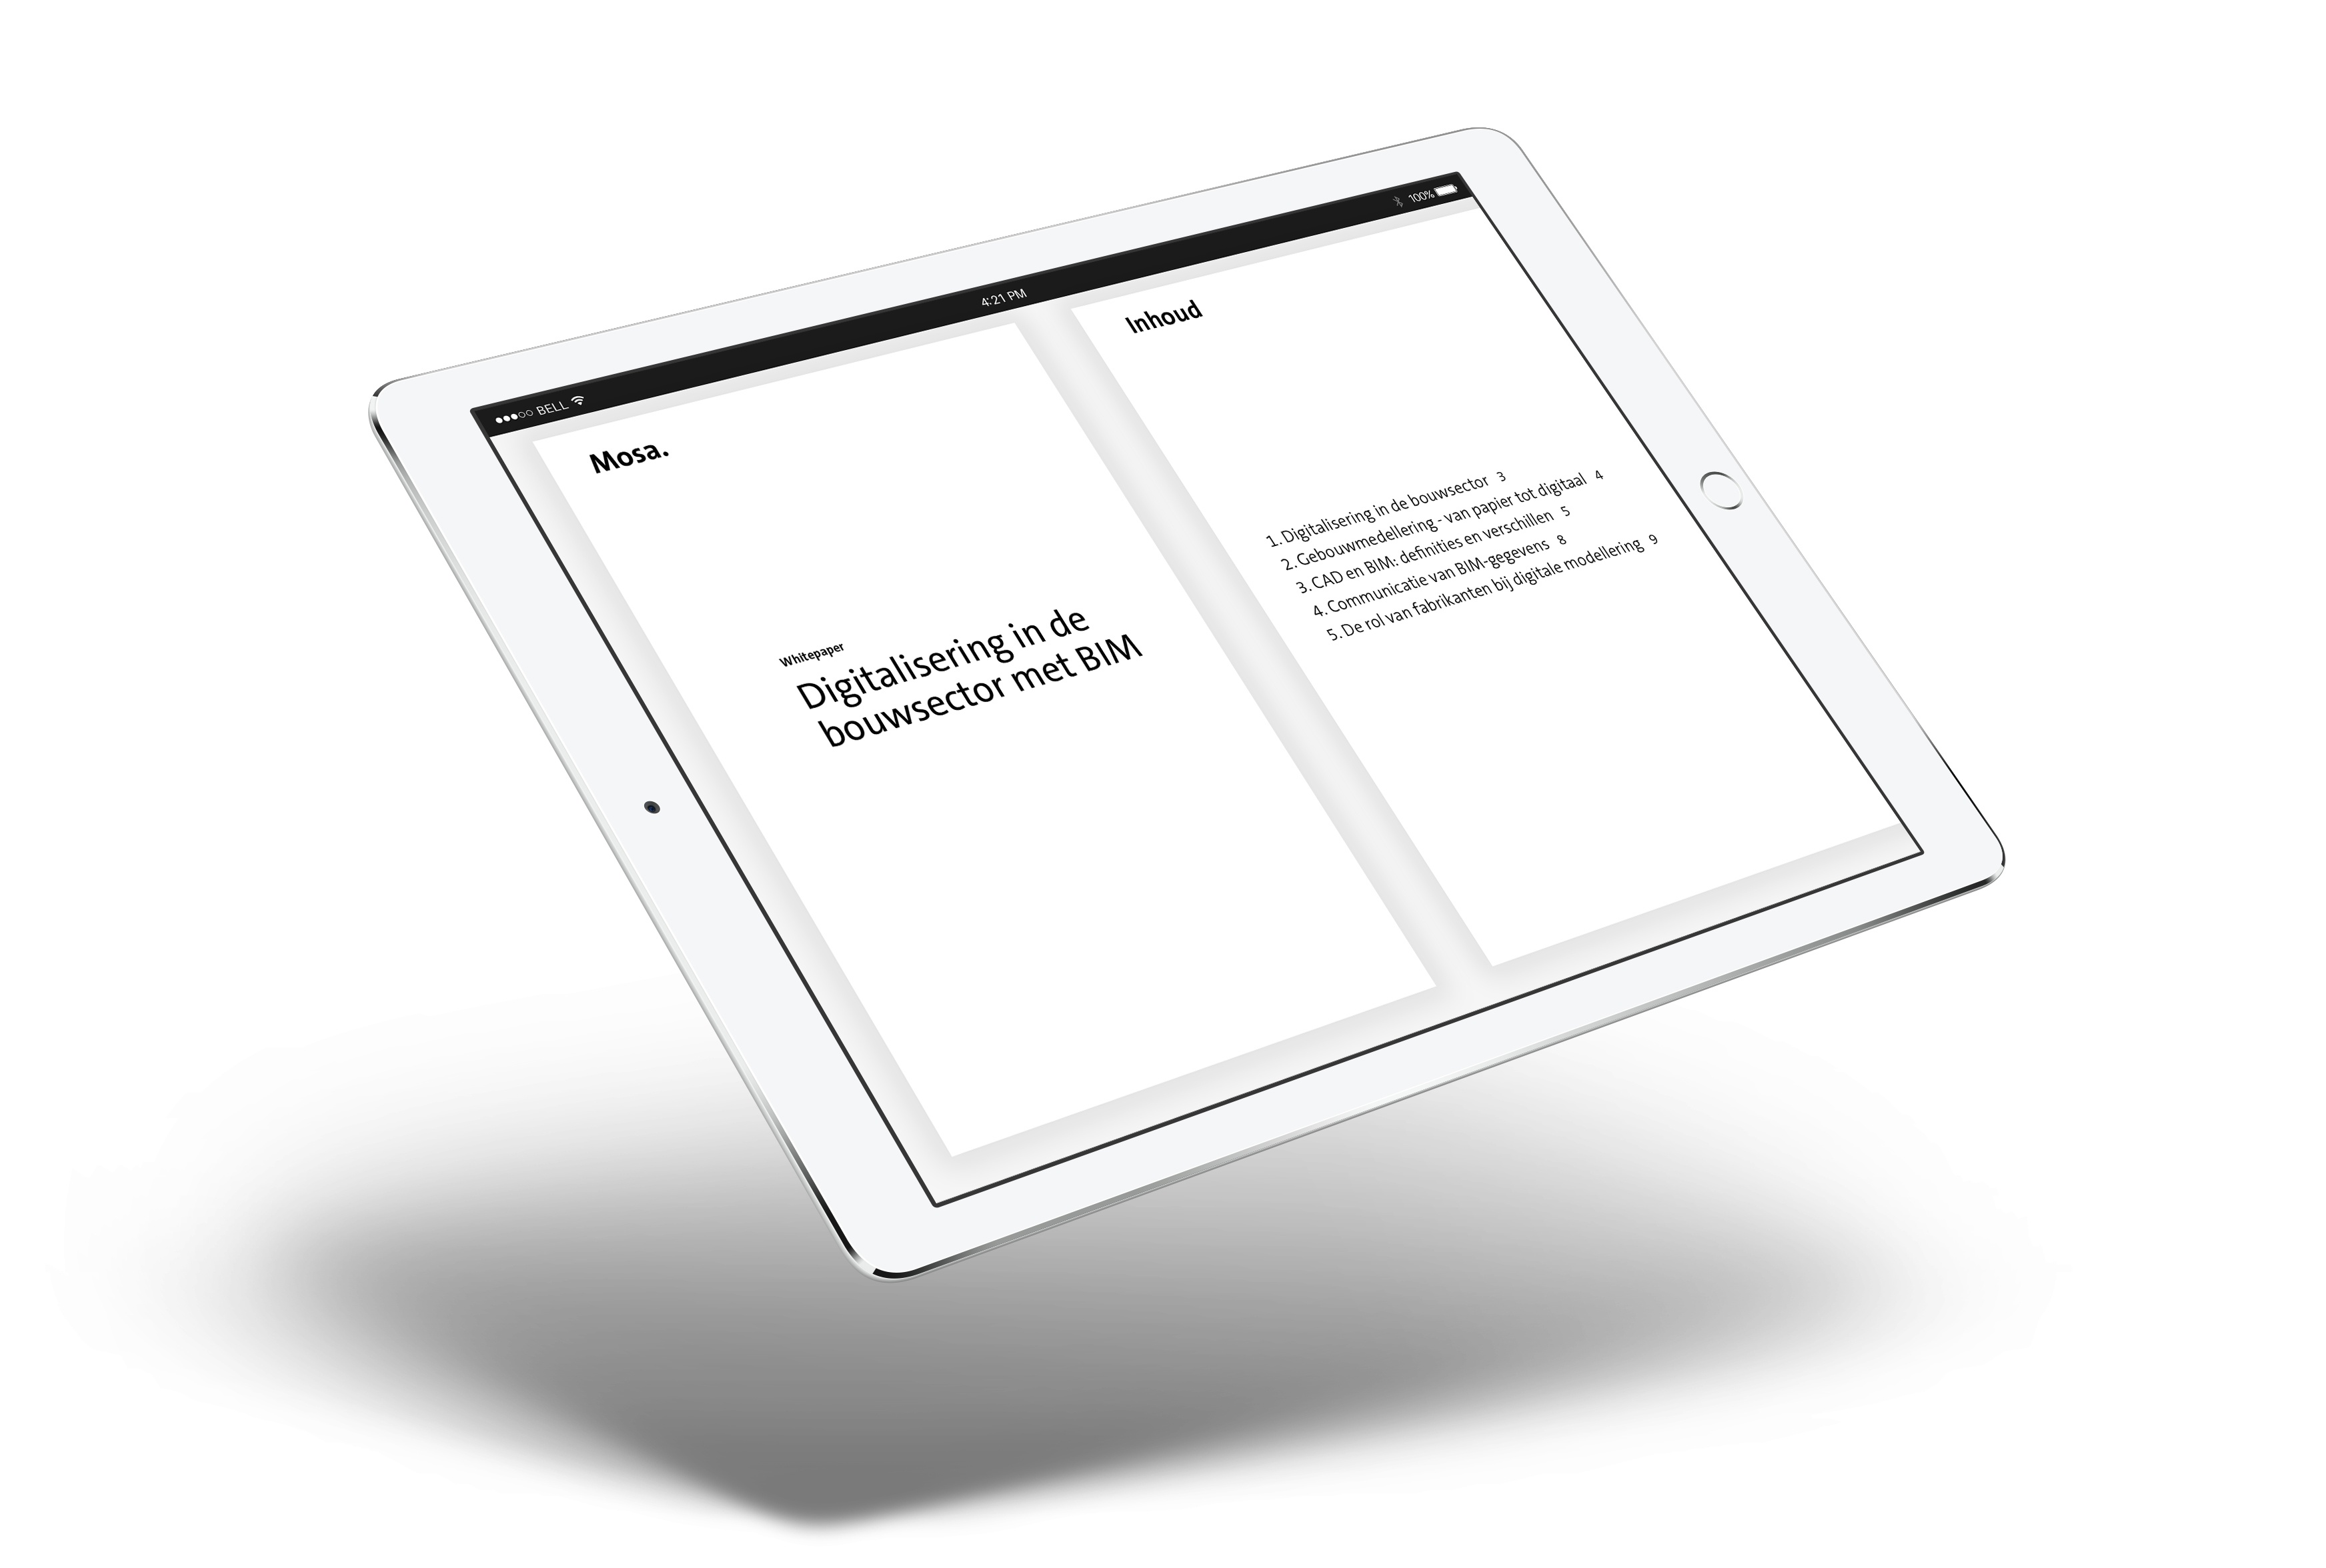 NL-WHITEPAPER-iPad-Landscape.jpg